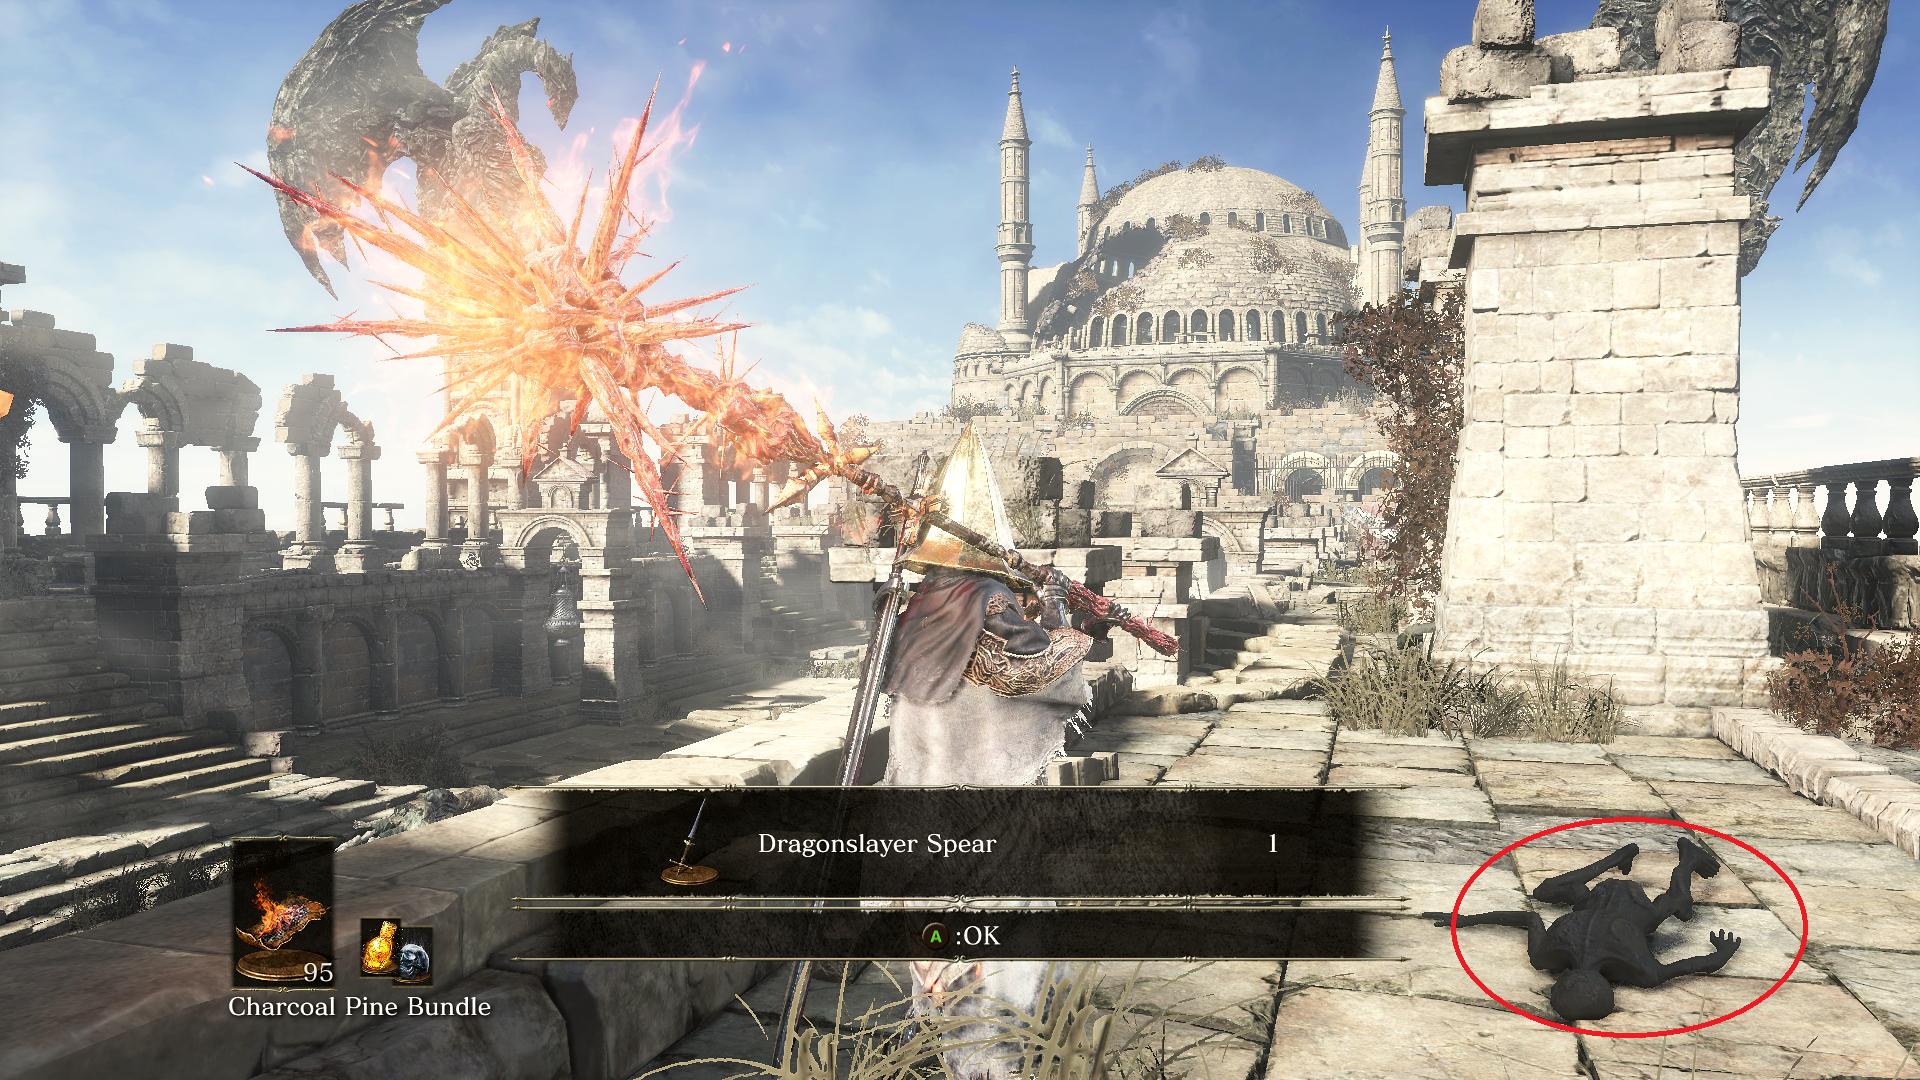 dragonslayer_spear.png